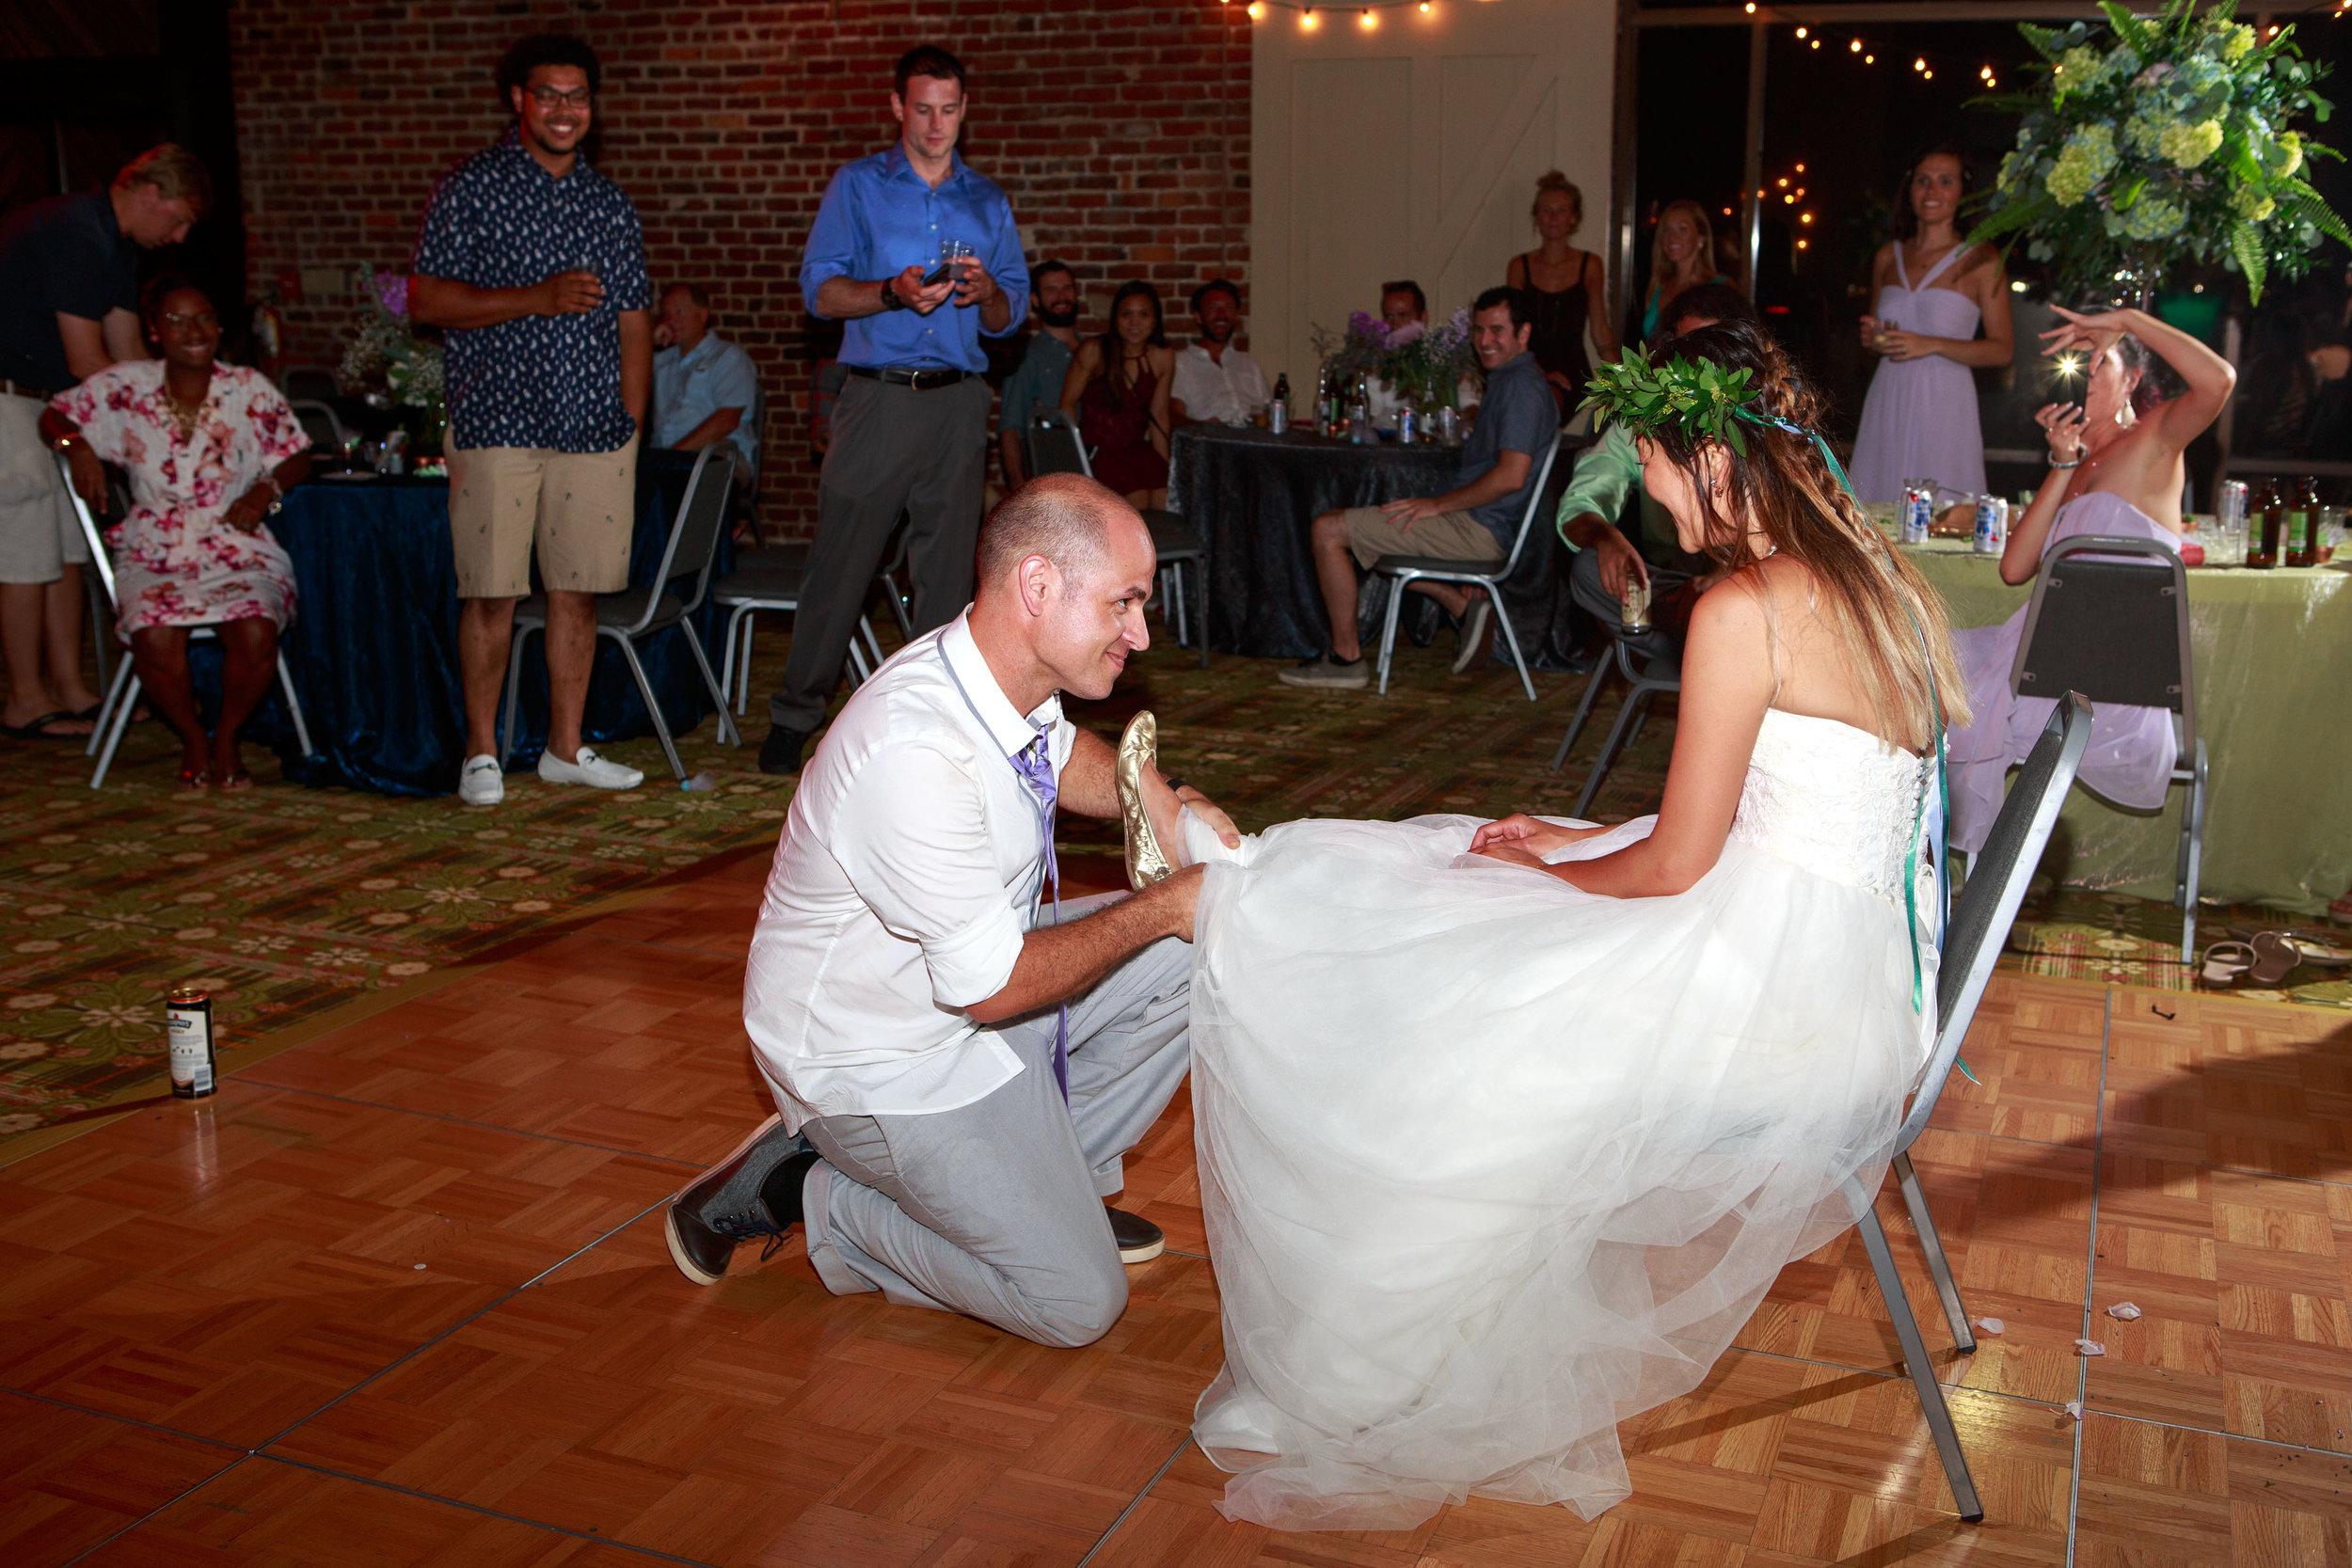 North_Carolina_Wedding_Photographer_Tiffany_Abruzzo_Reception_290.jpg